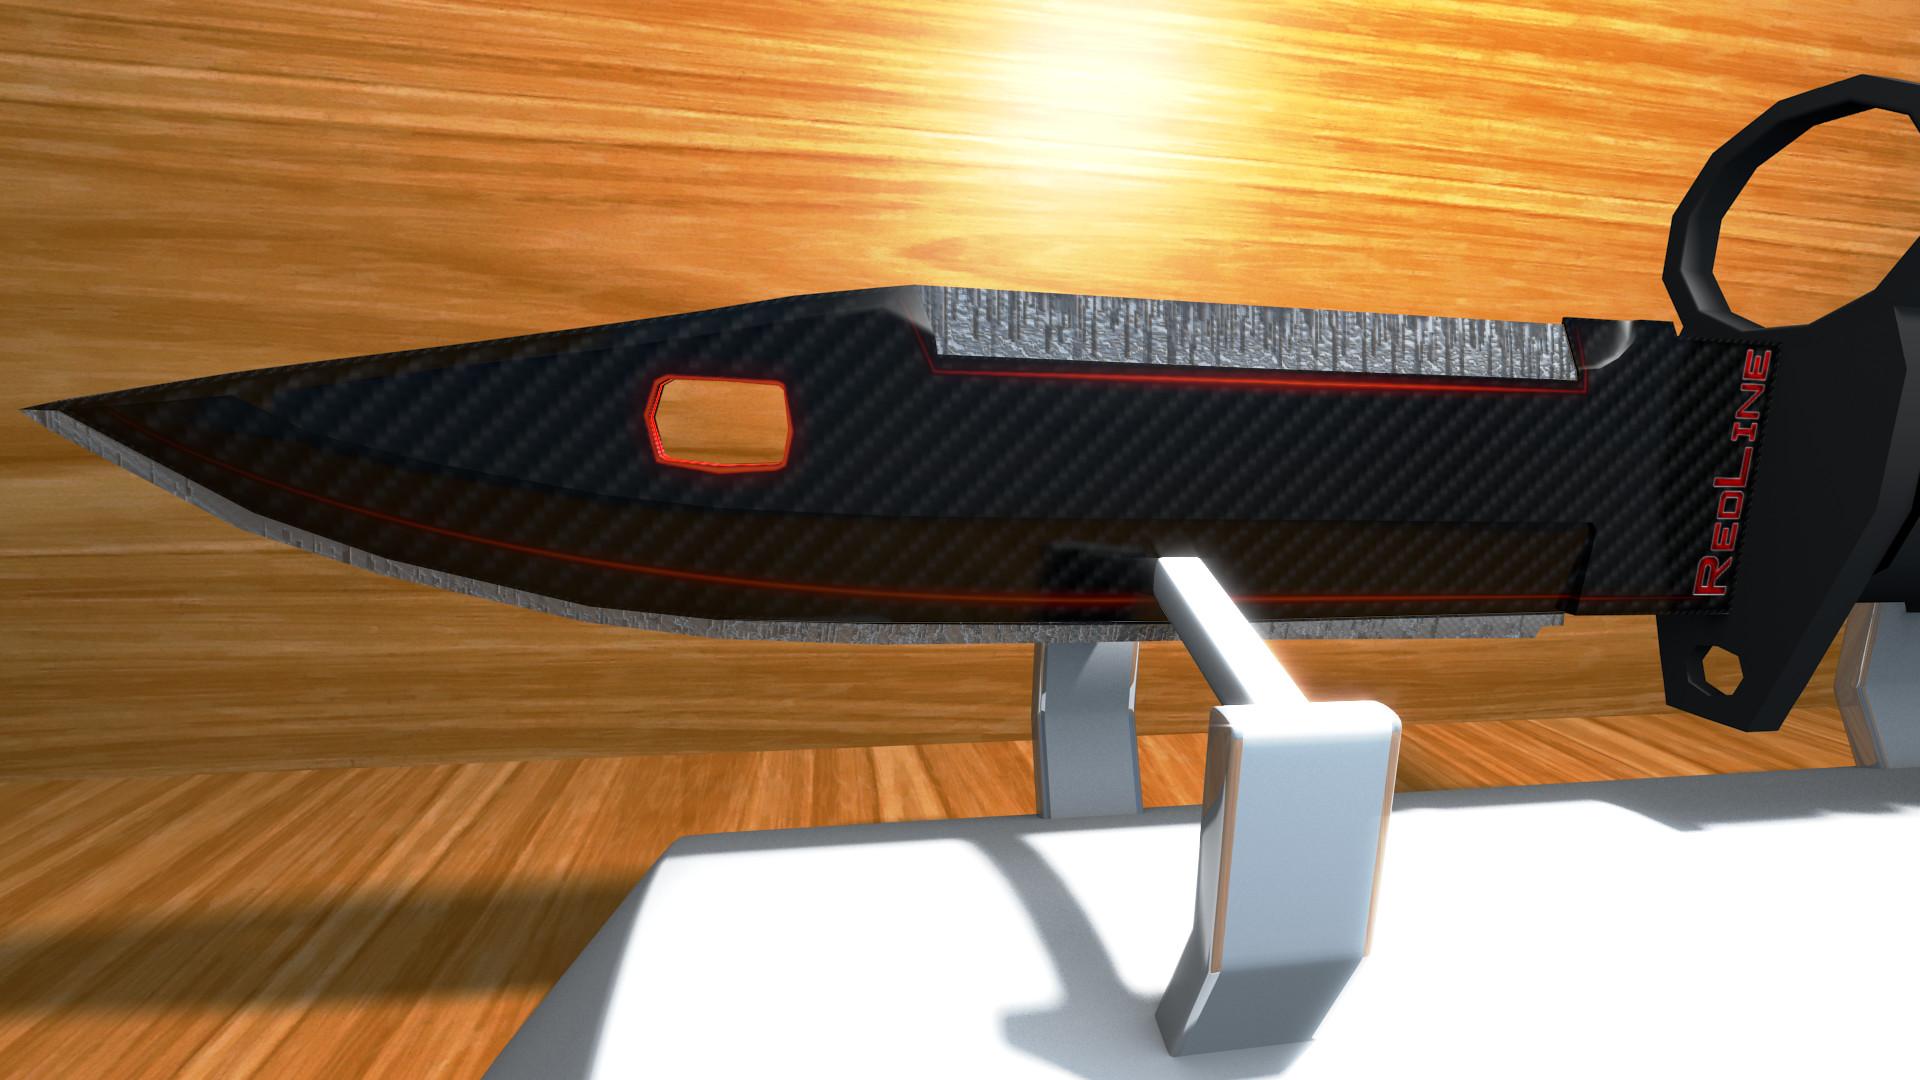 … M9 Bayonet Redline (Concept Art – CS:Go Skin) by Fineline321